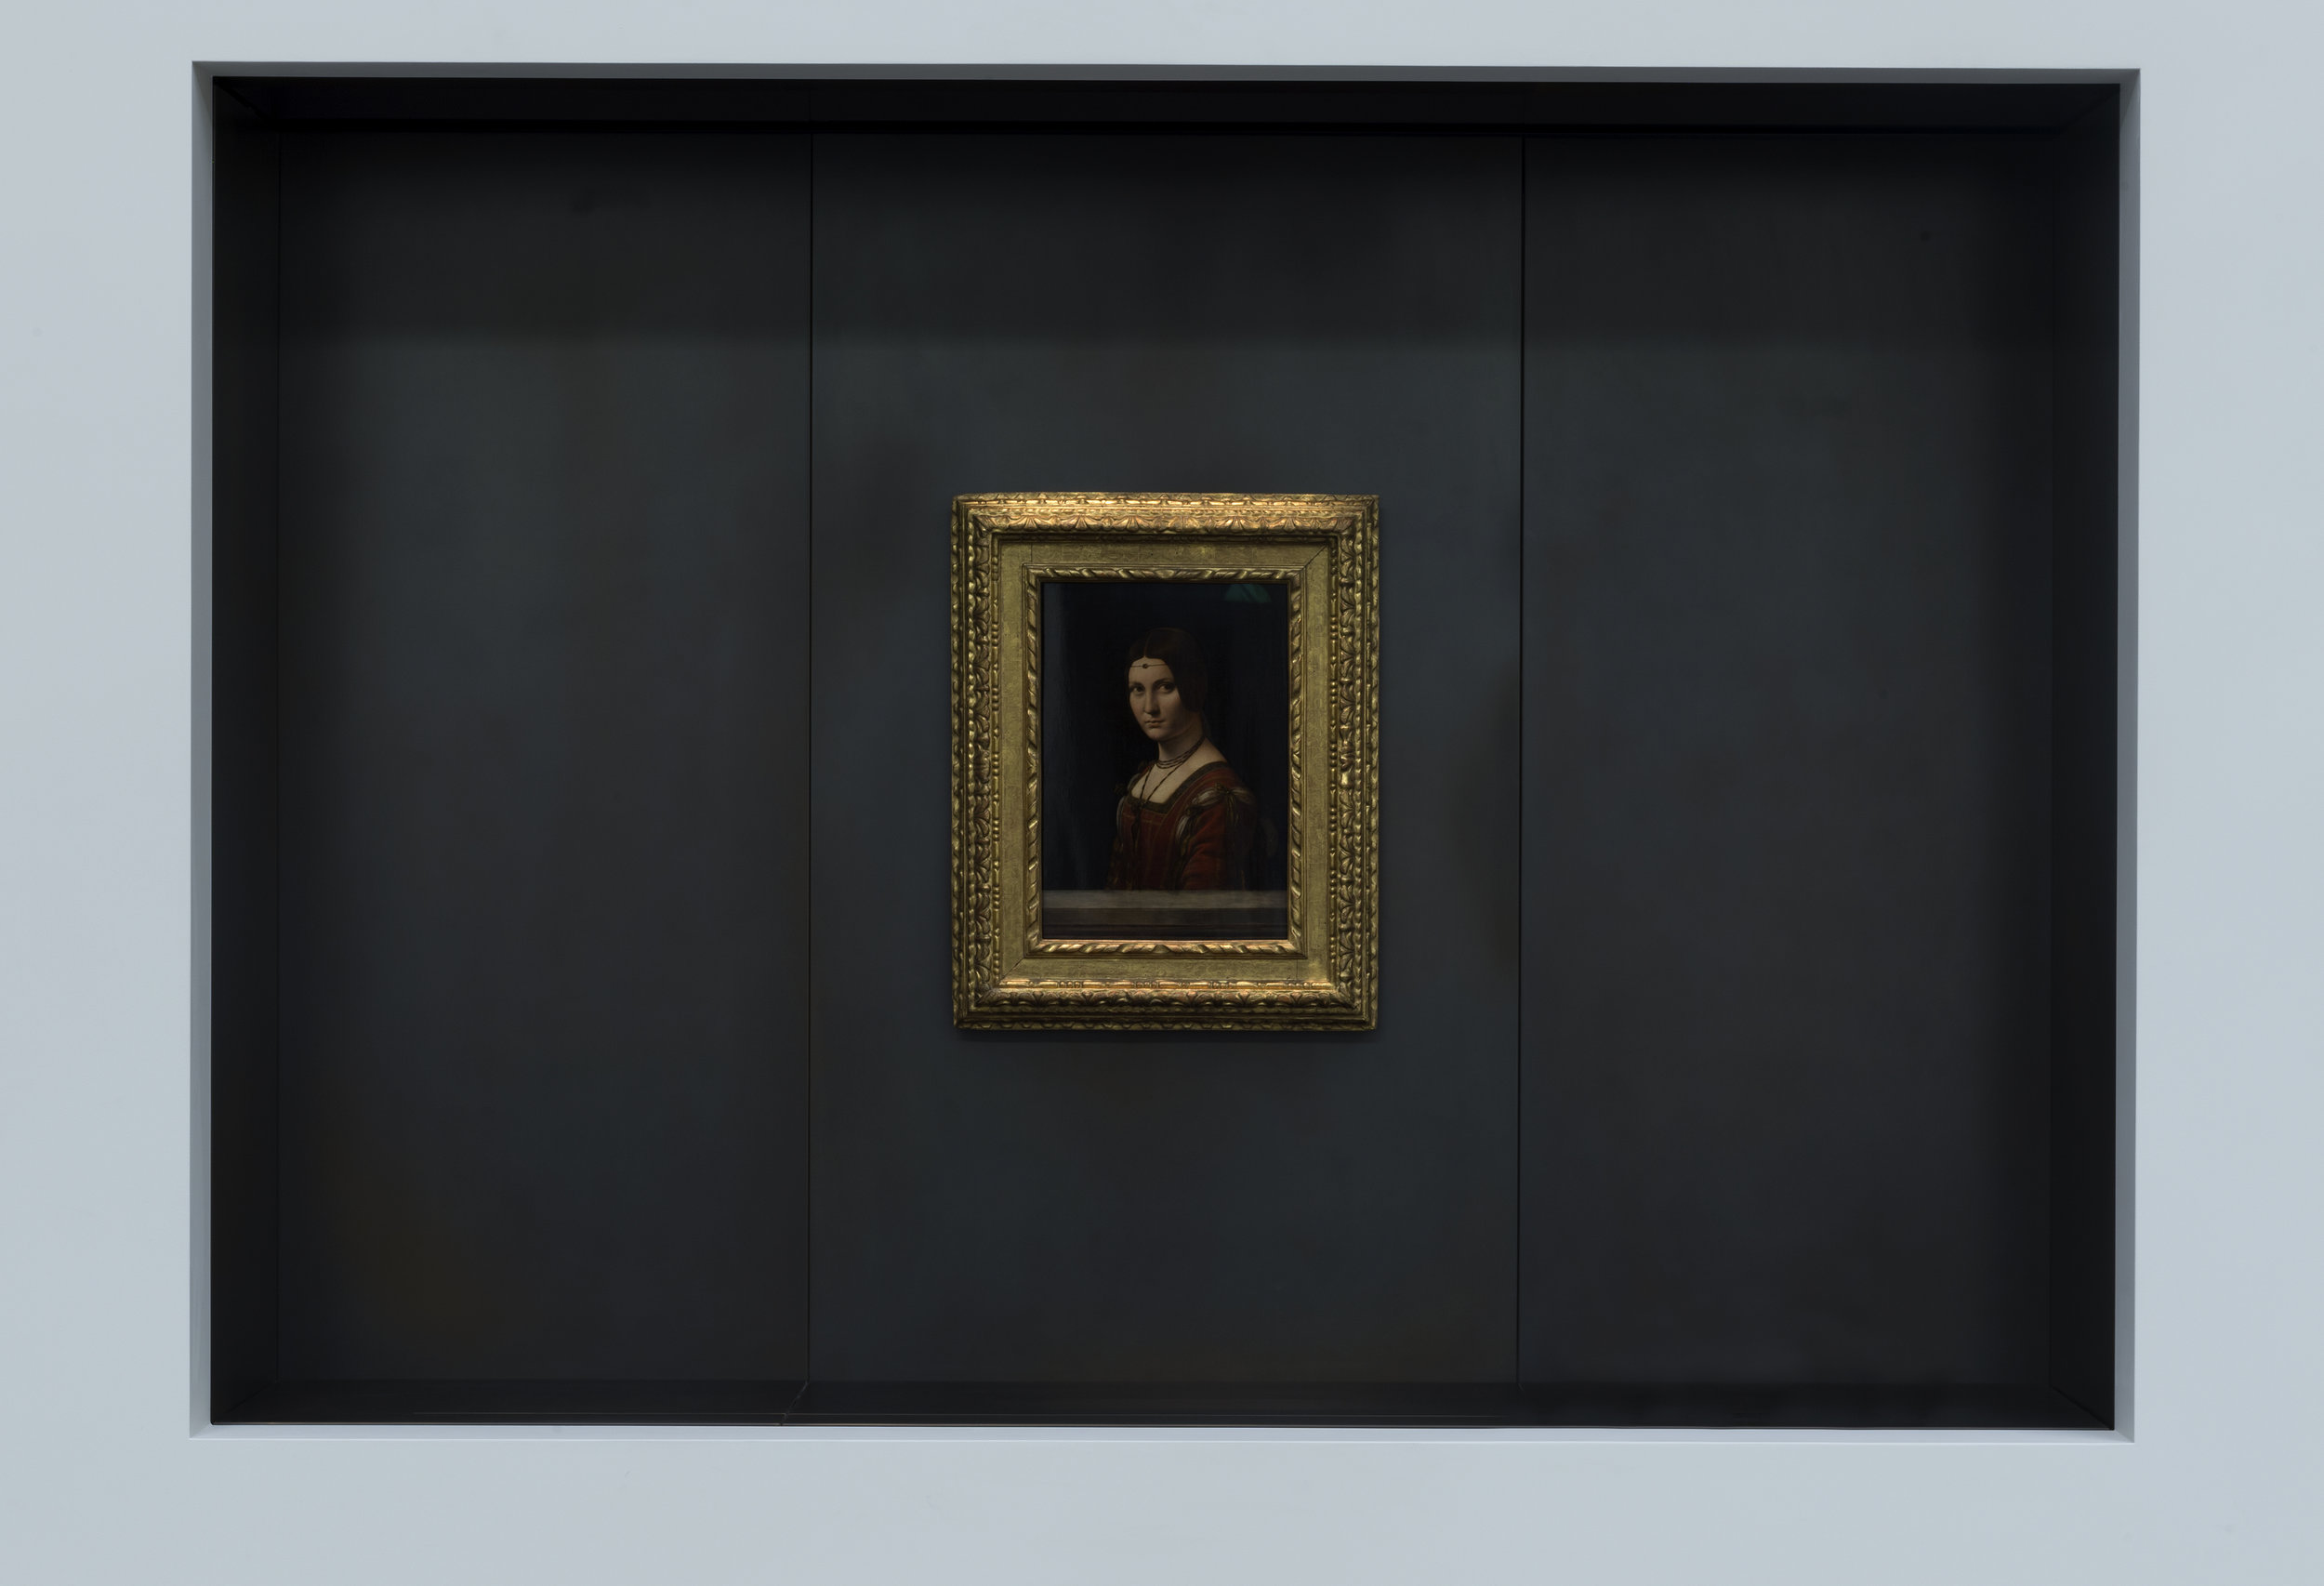 Leonardo da Vinci. La Belle Ferroniere, a loan from the Musée du Louvre, Paris © Louvre Abu Dhabi